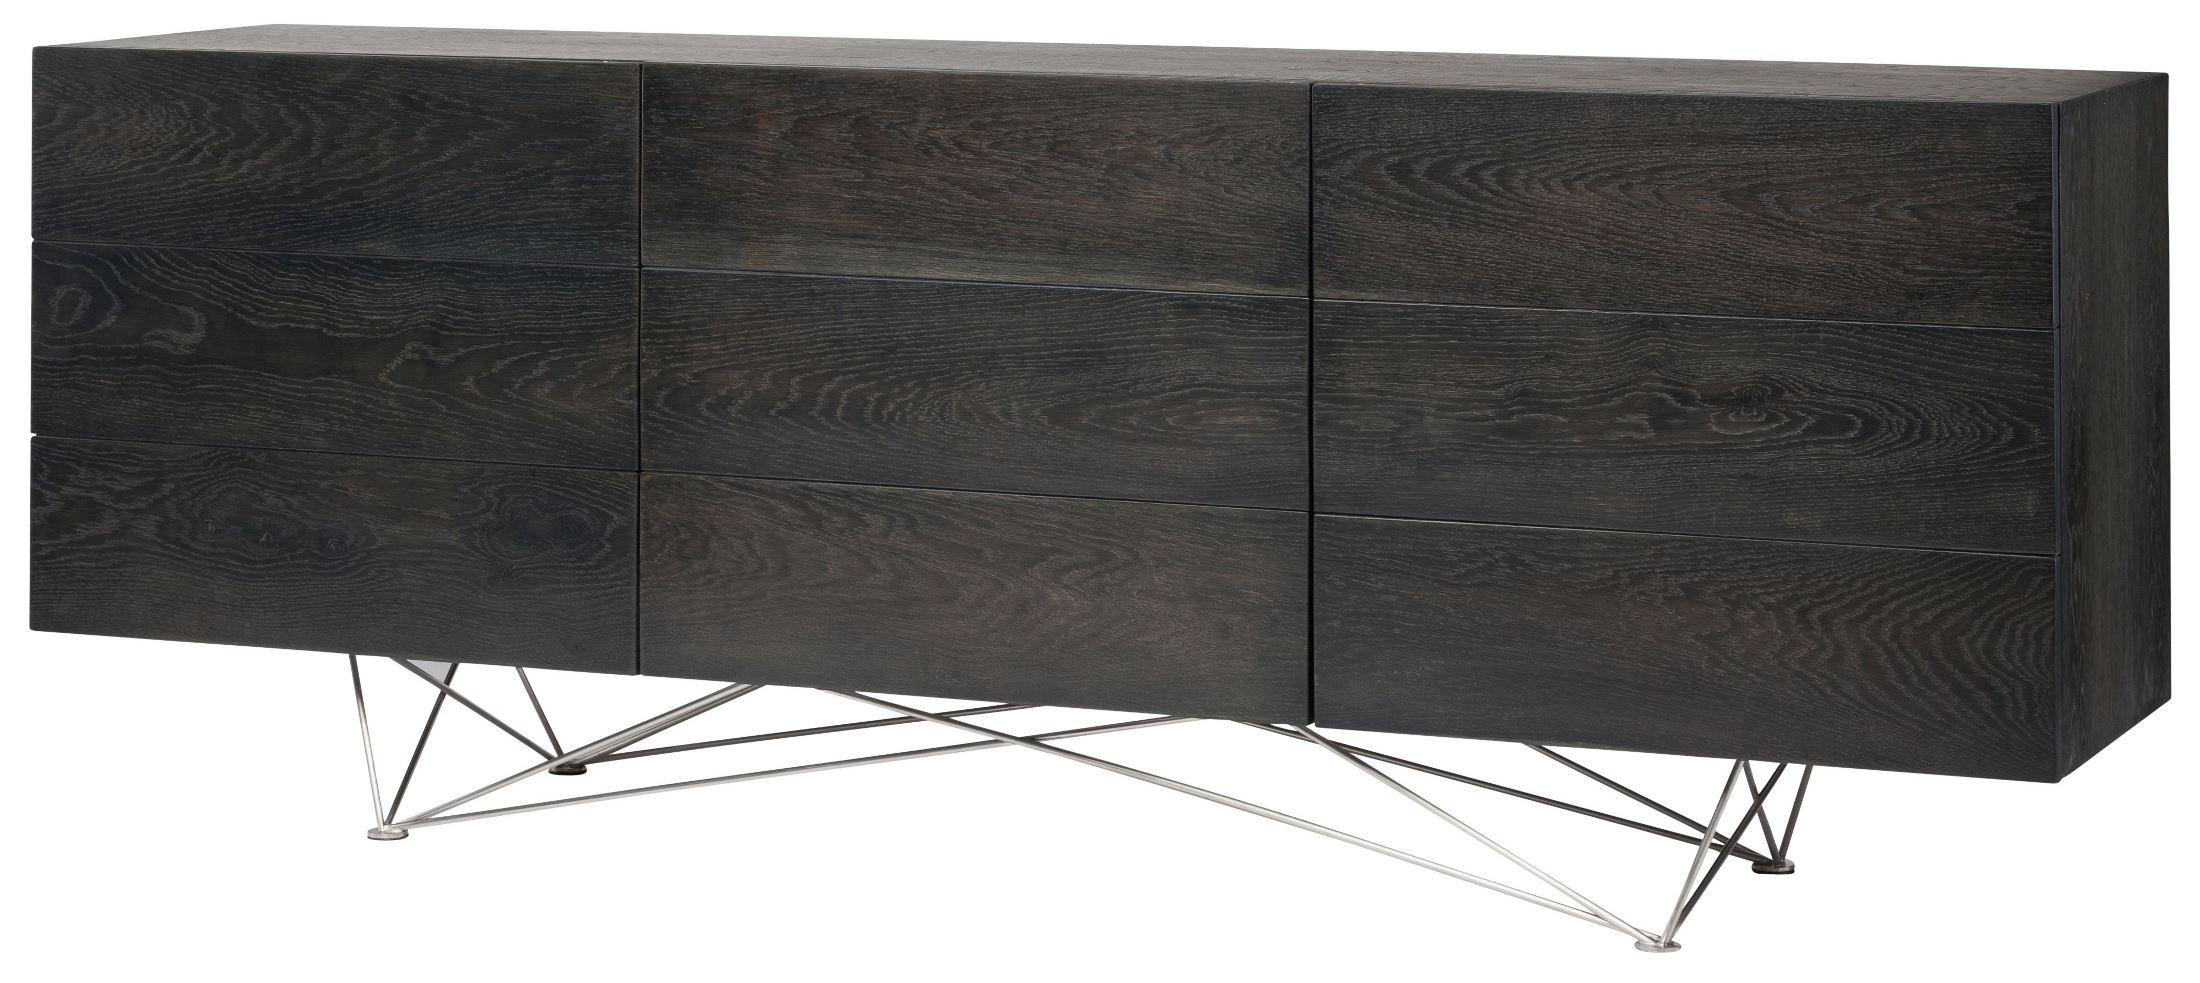 Zola Bathroom Mirrors zola ebonized wood sideboard cabinet from nuevo | coleman furniture